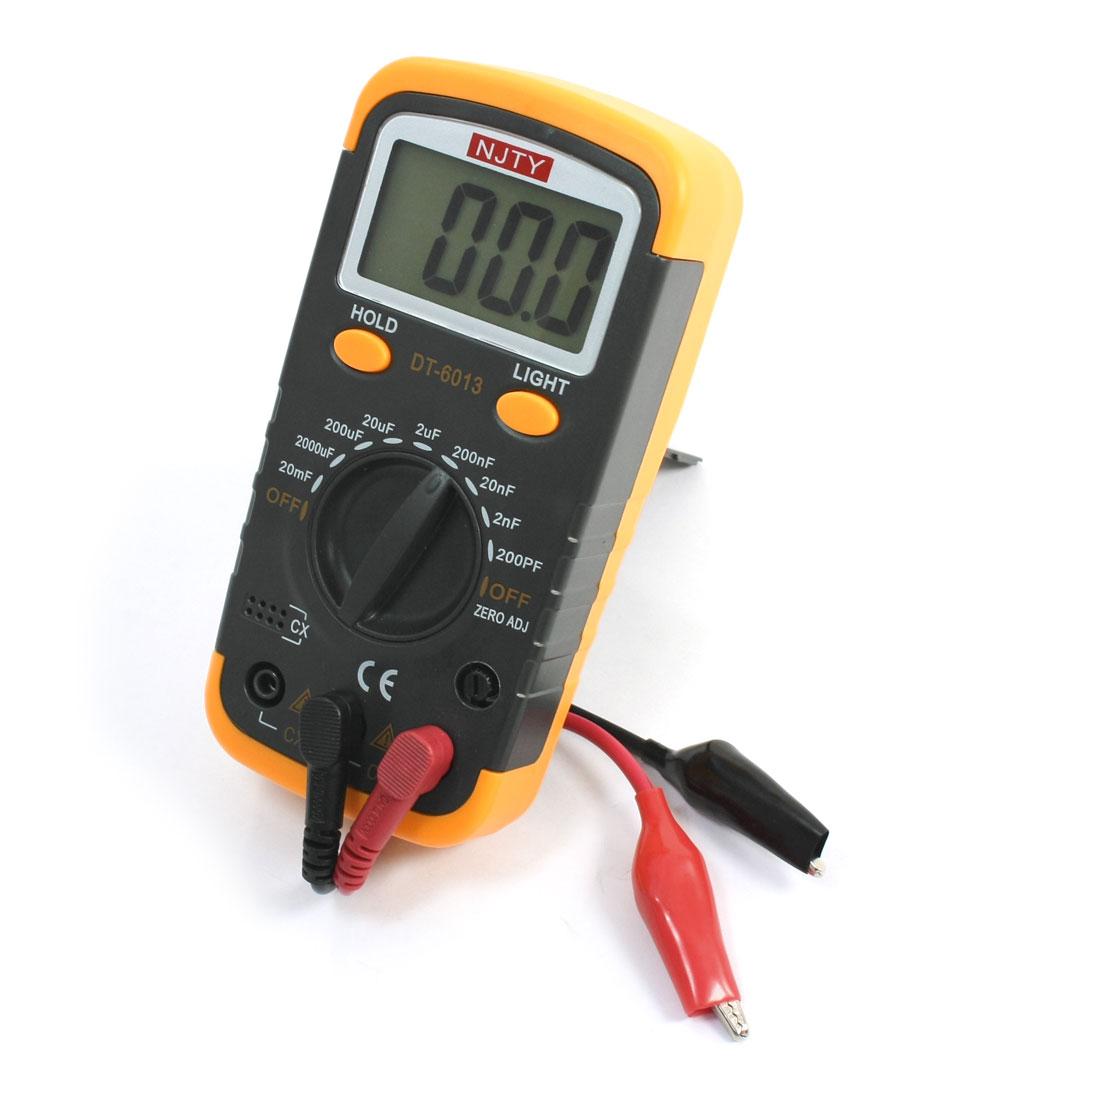 DT-6013 LCD 200PF-20mF Range Capacity Tester Digital Capacitance Meter